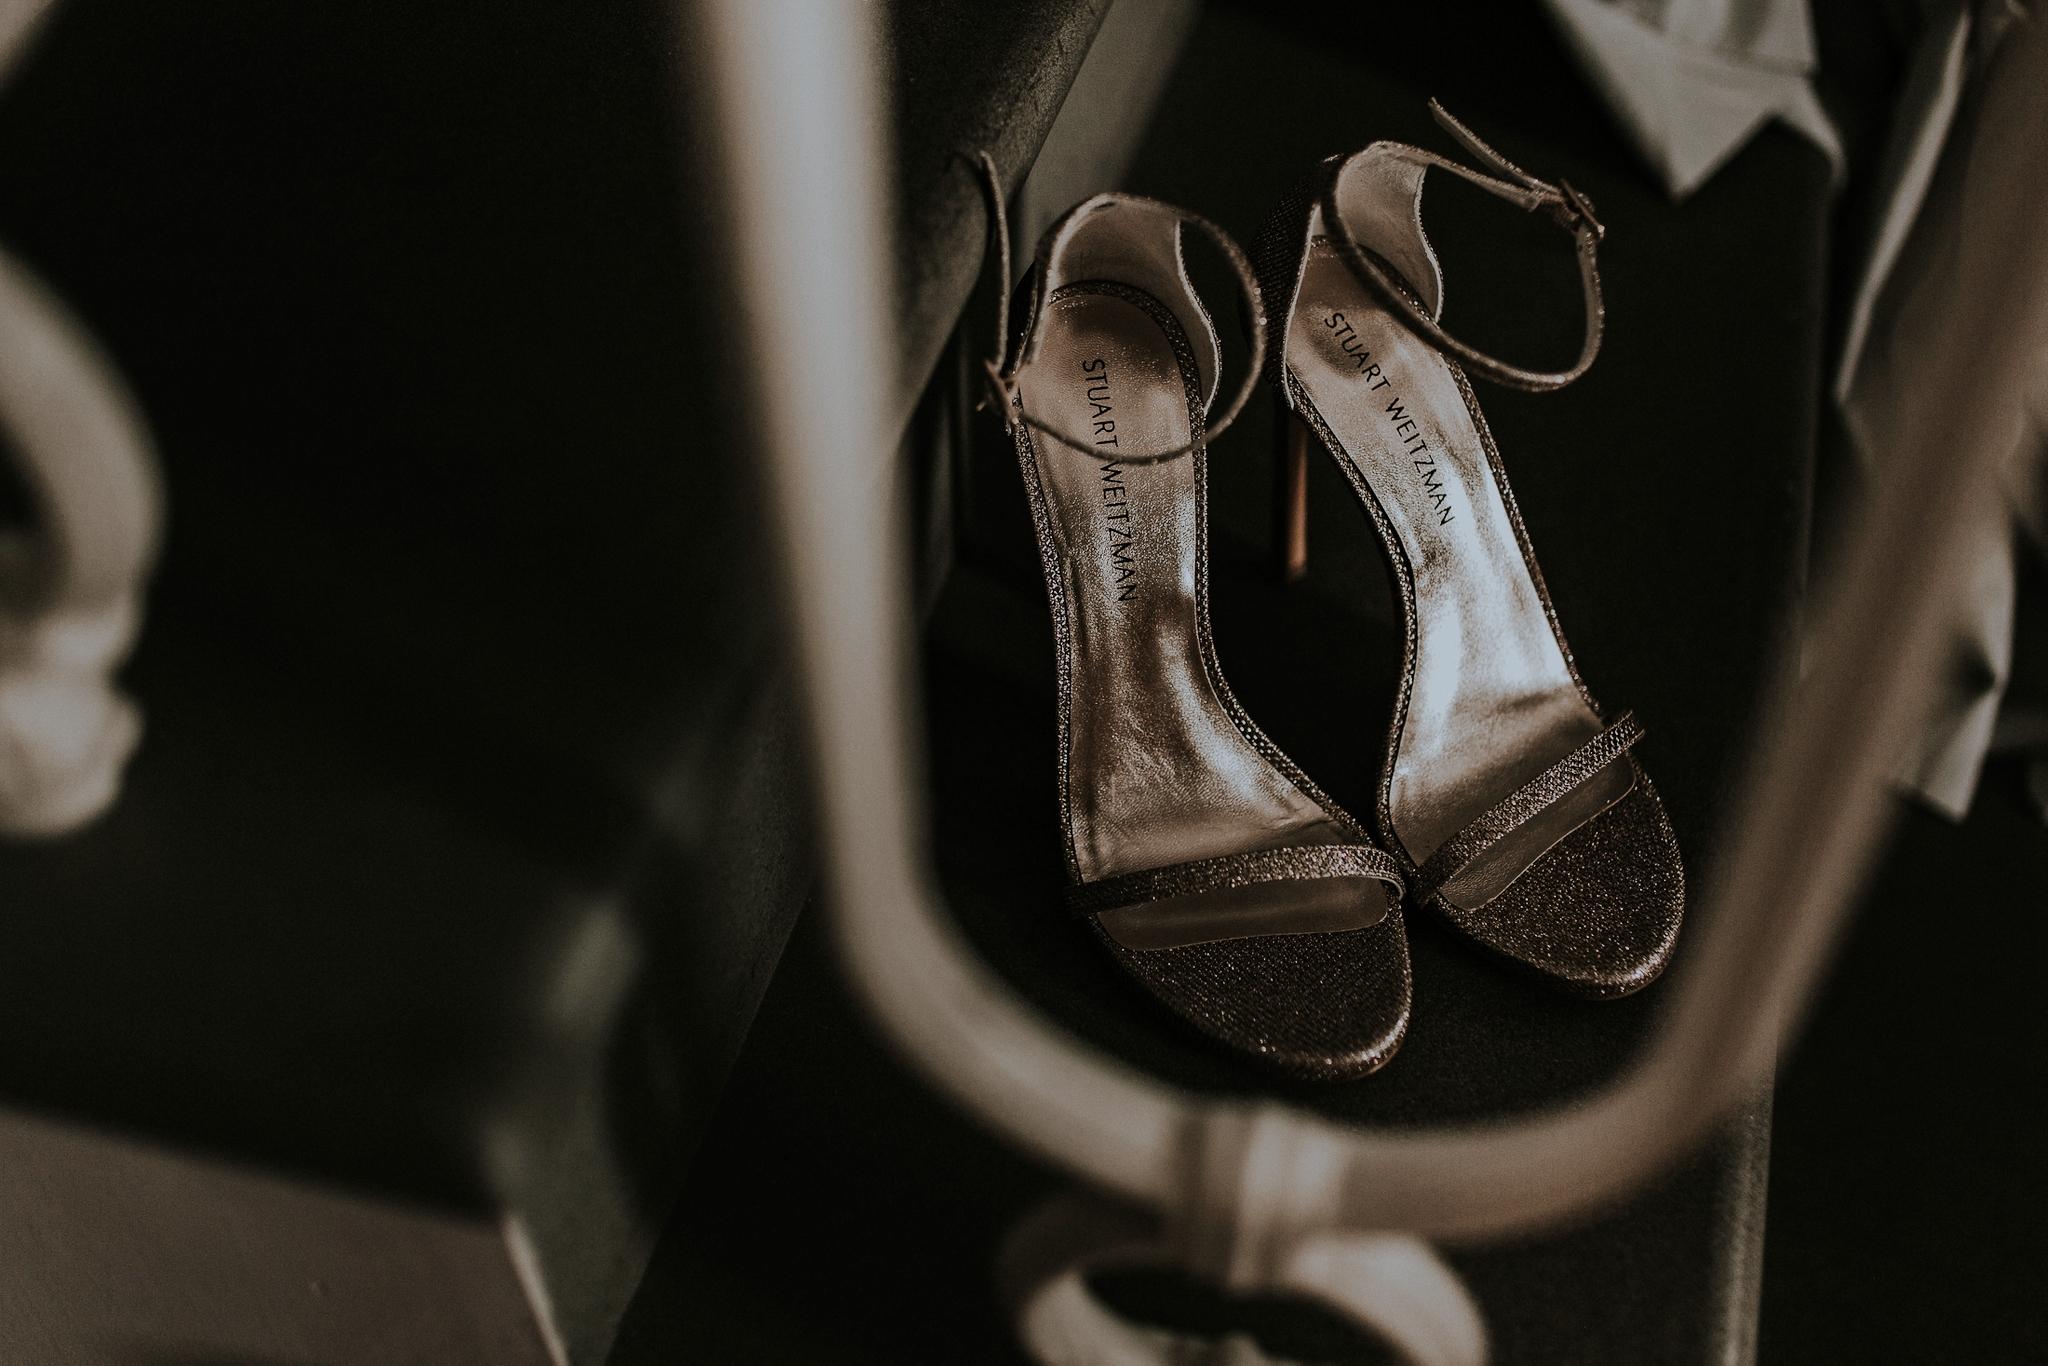 destination-austin-wedding-photographer-italy-florence424.JPG